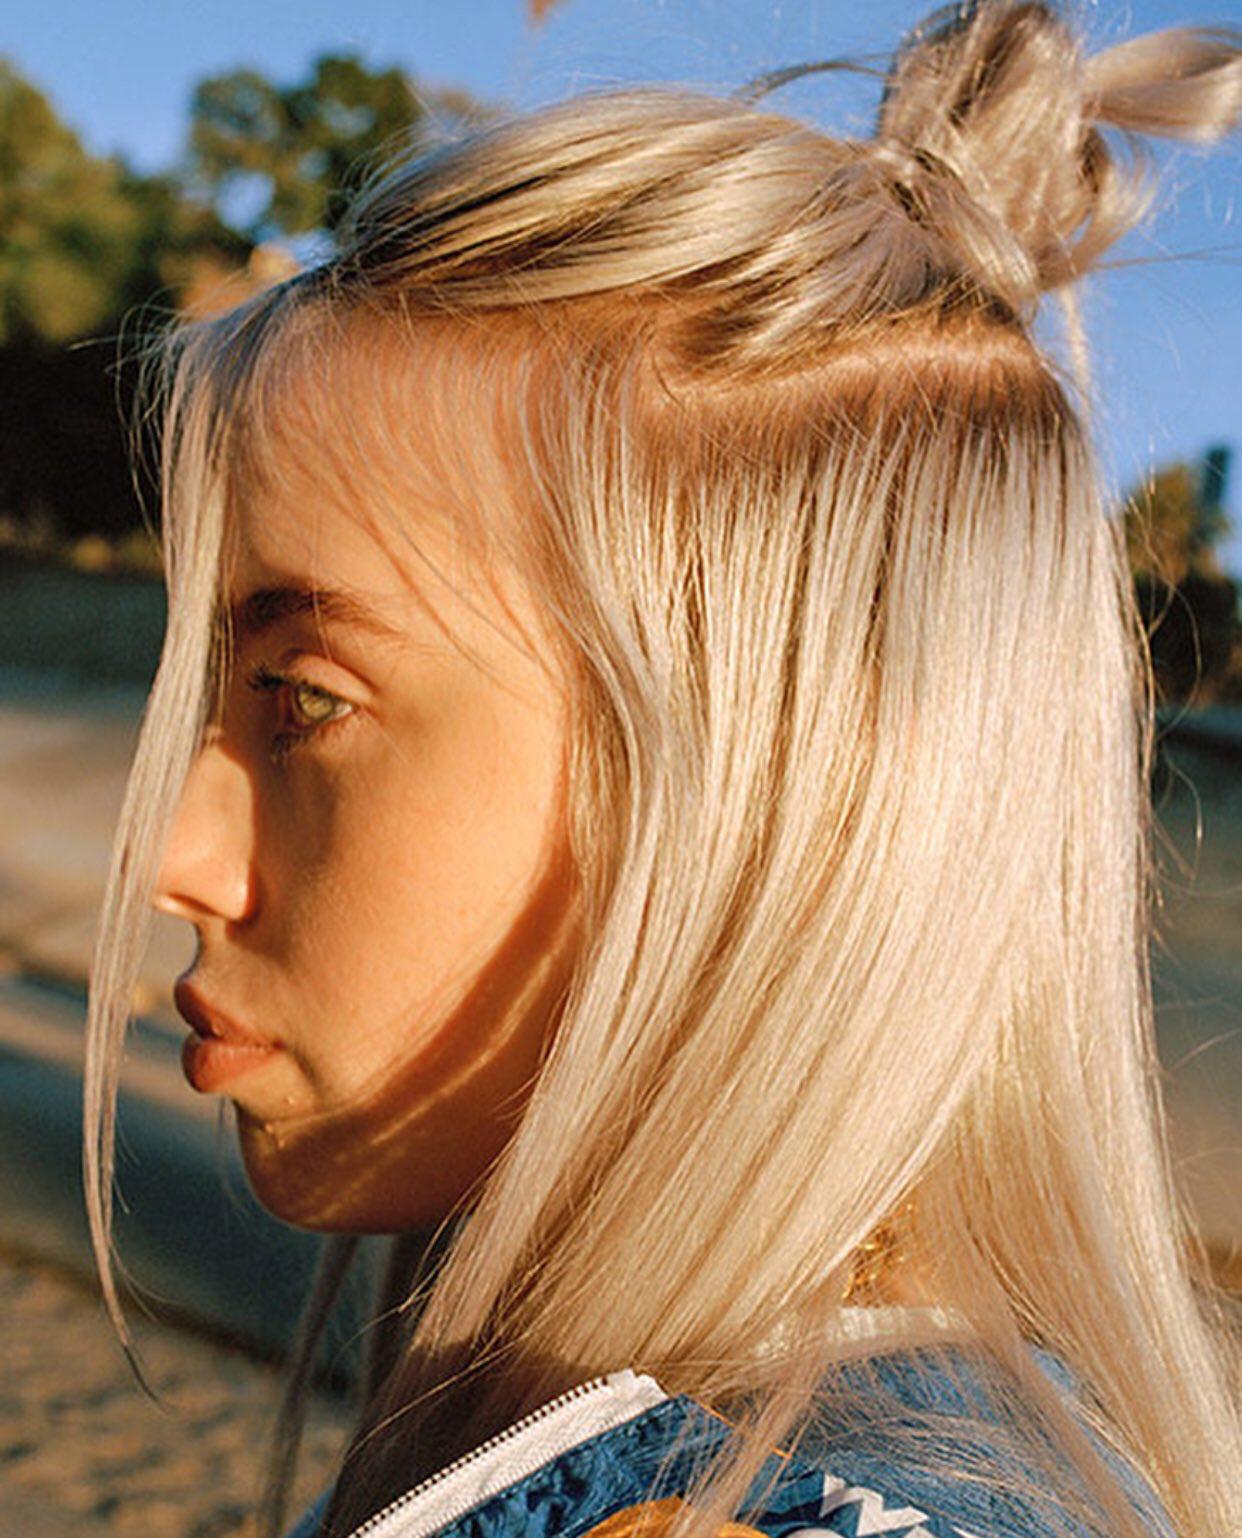 Billieeilish | F R I Z Z | Billie Eilish, Hair, Hair Goals